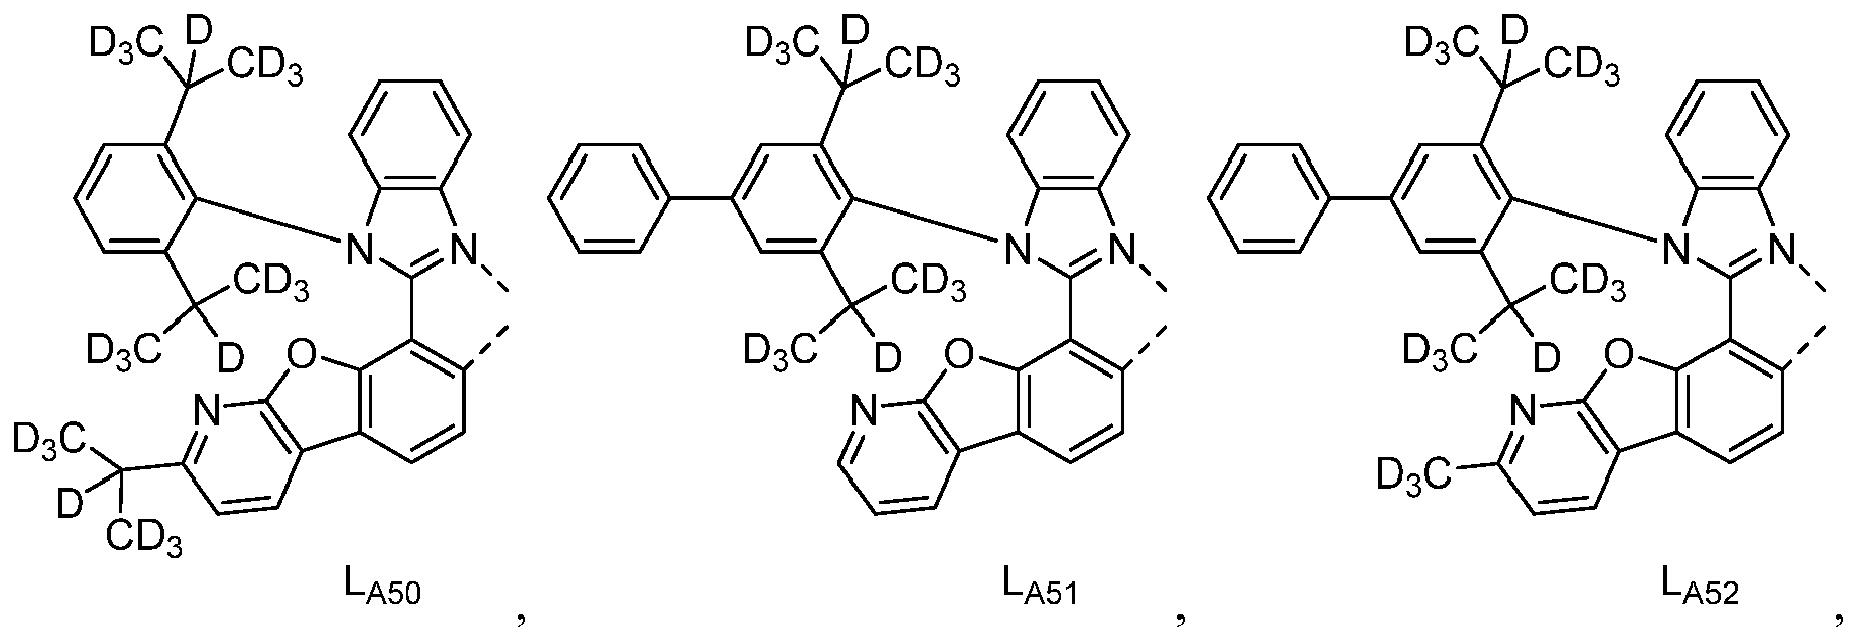 Figure imgb0299